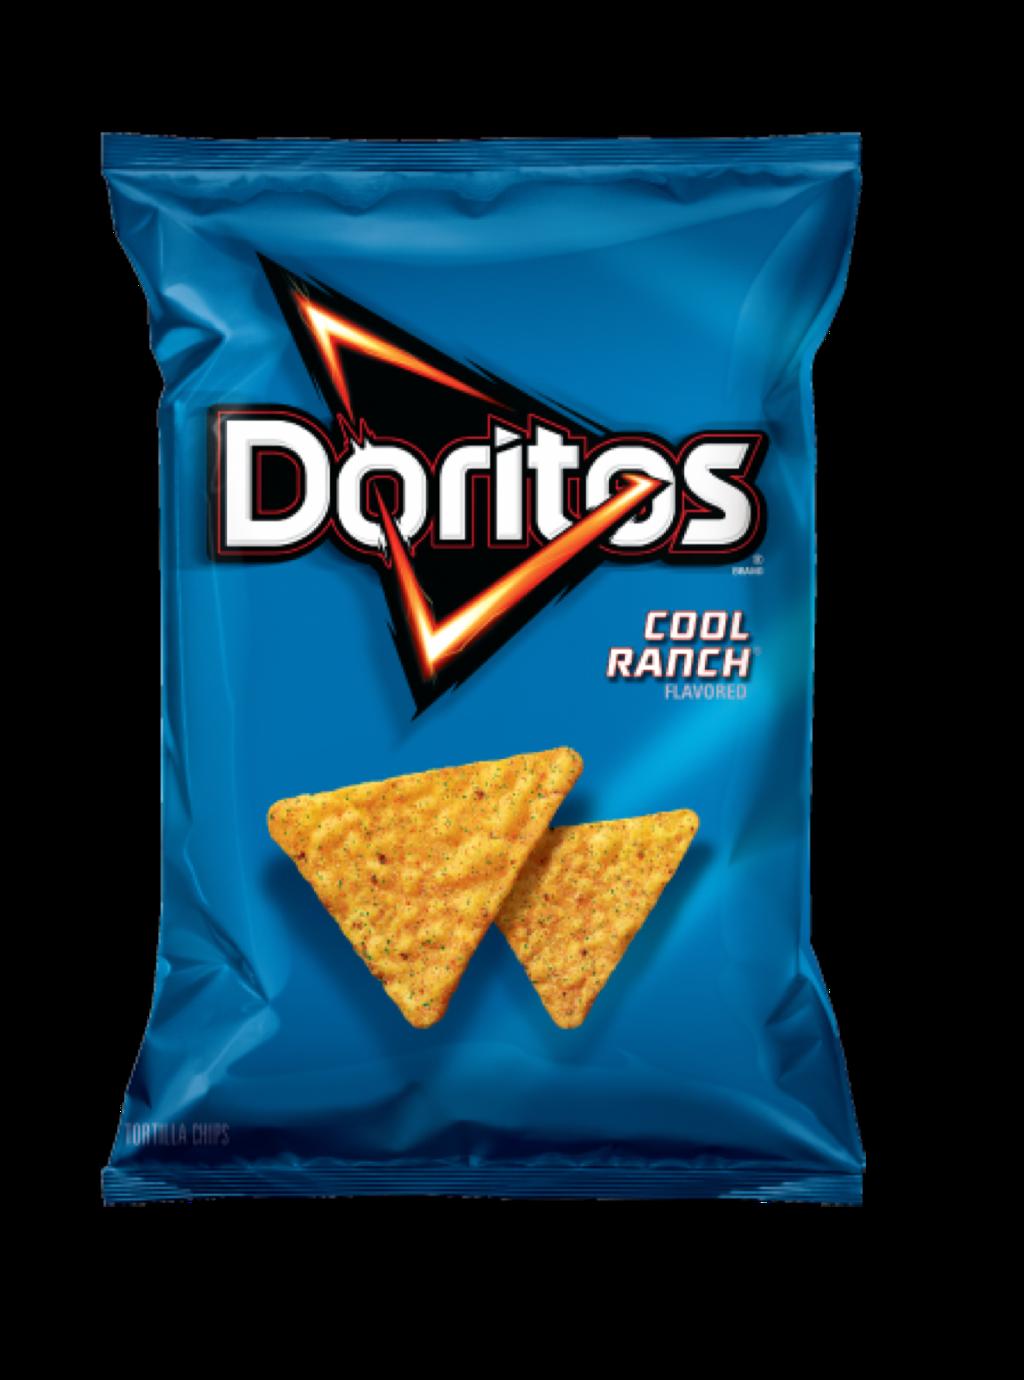 #doritos #coolranch #freetoedit